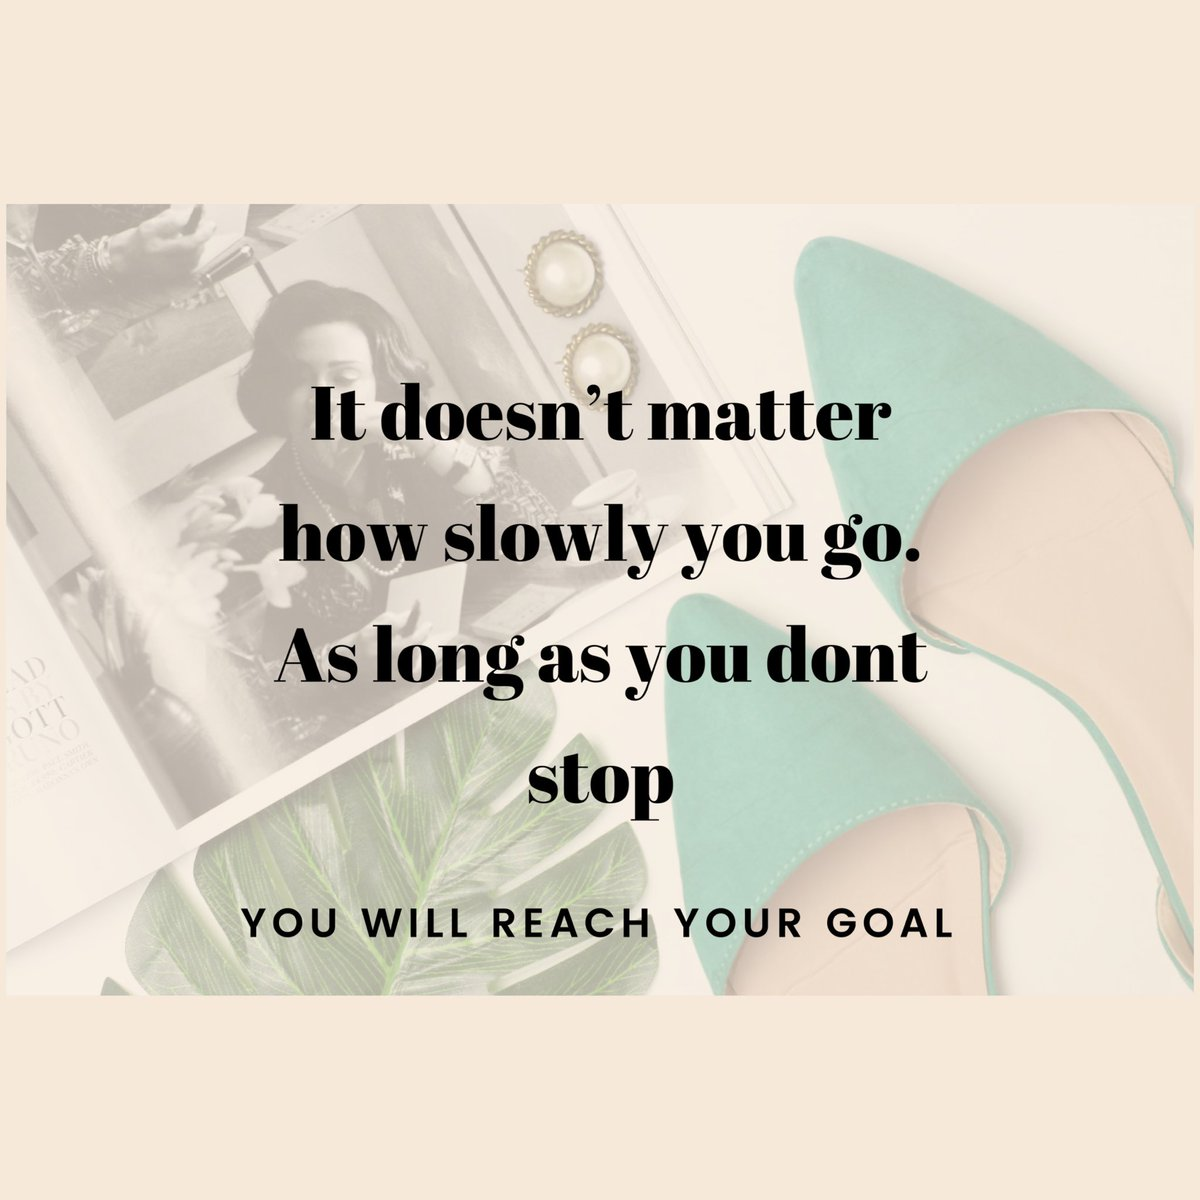 Keep moving   #ukblogger #lagosblogger #nigerianblogger #lifestlyebloger #microinfluencer #smallinfluencer #smallbusiness #motivationpic.twitter.com/bdw57fKvCL